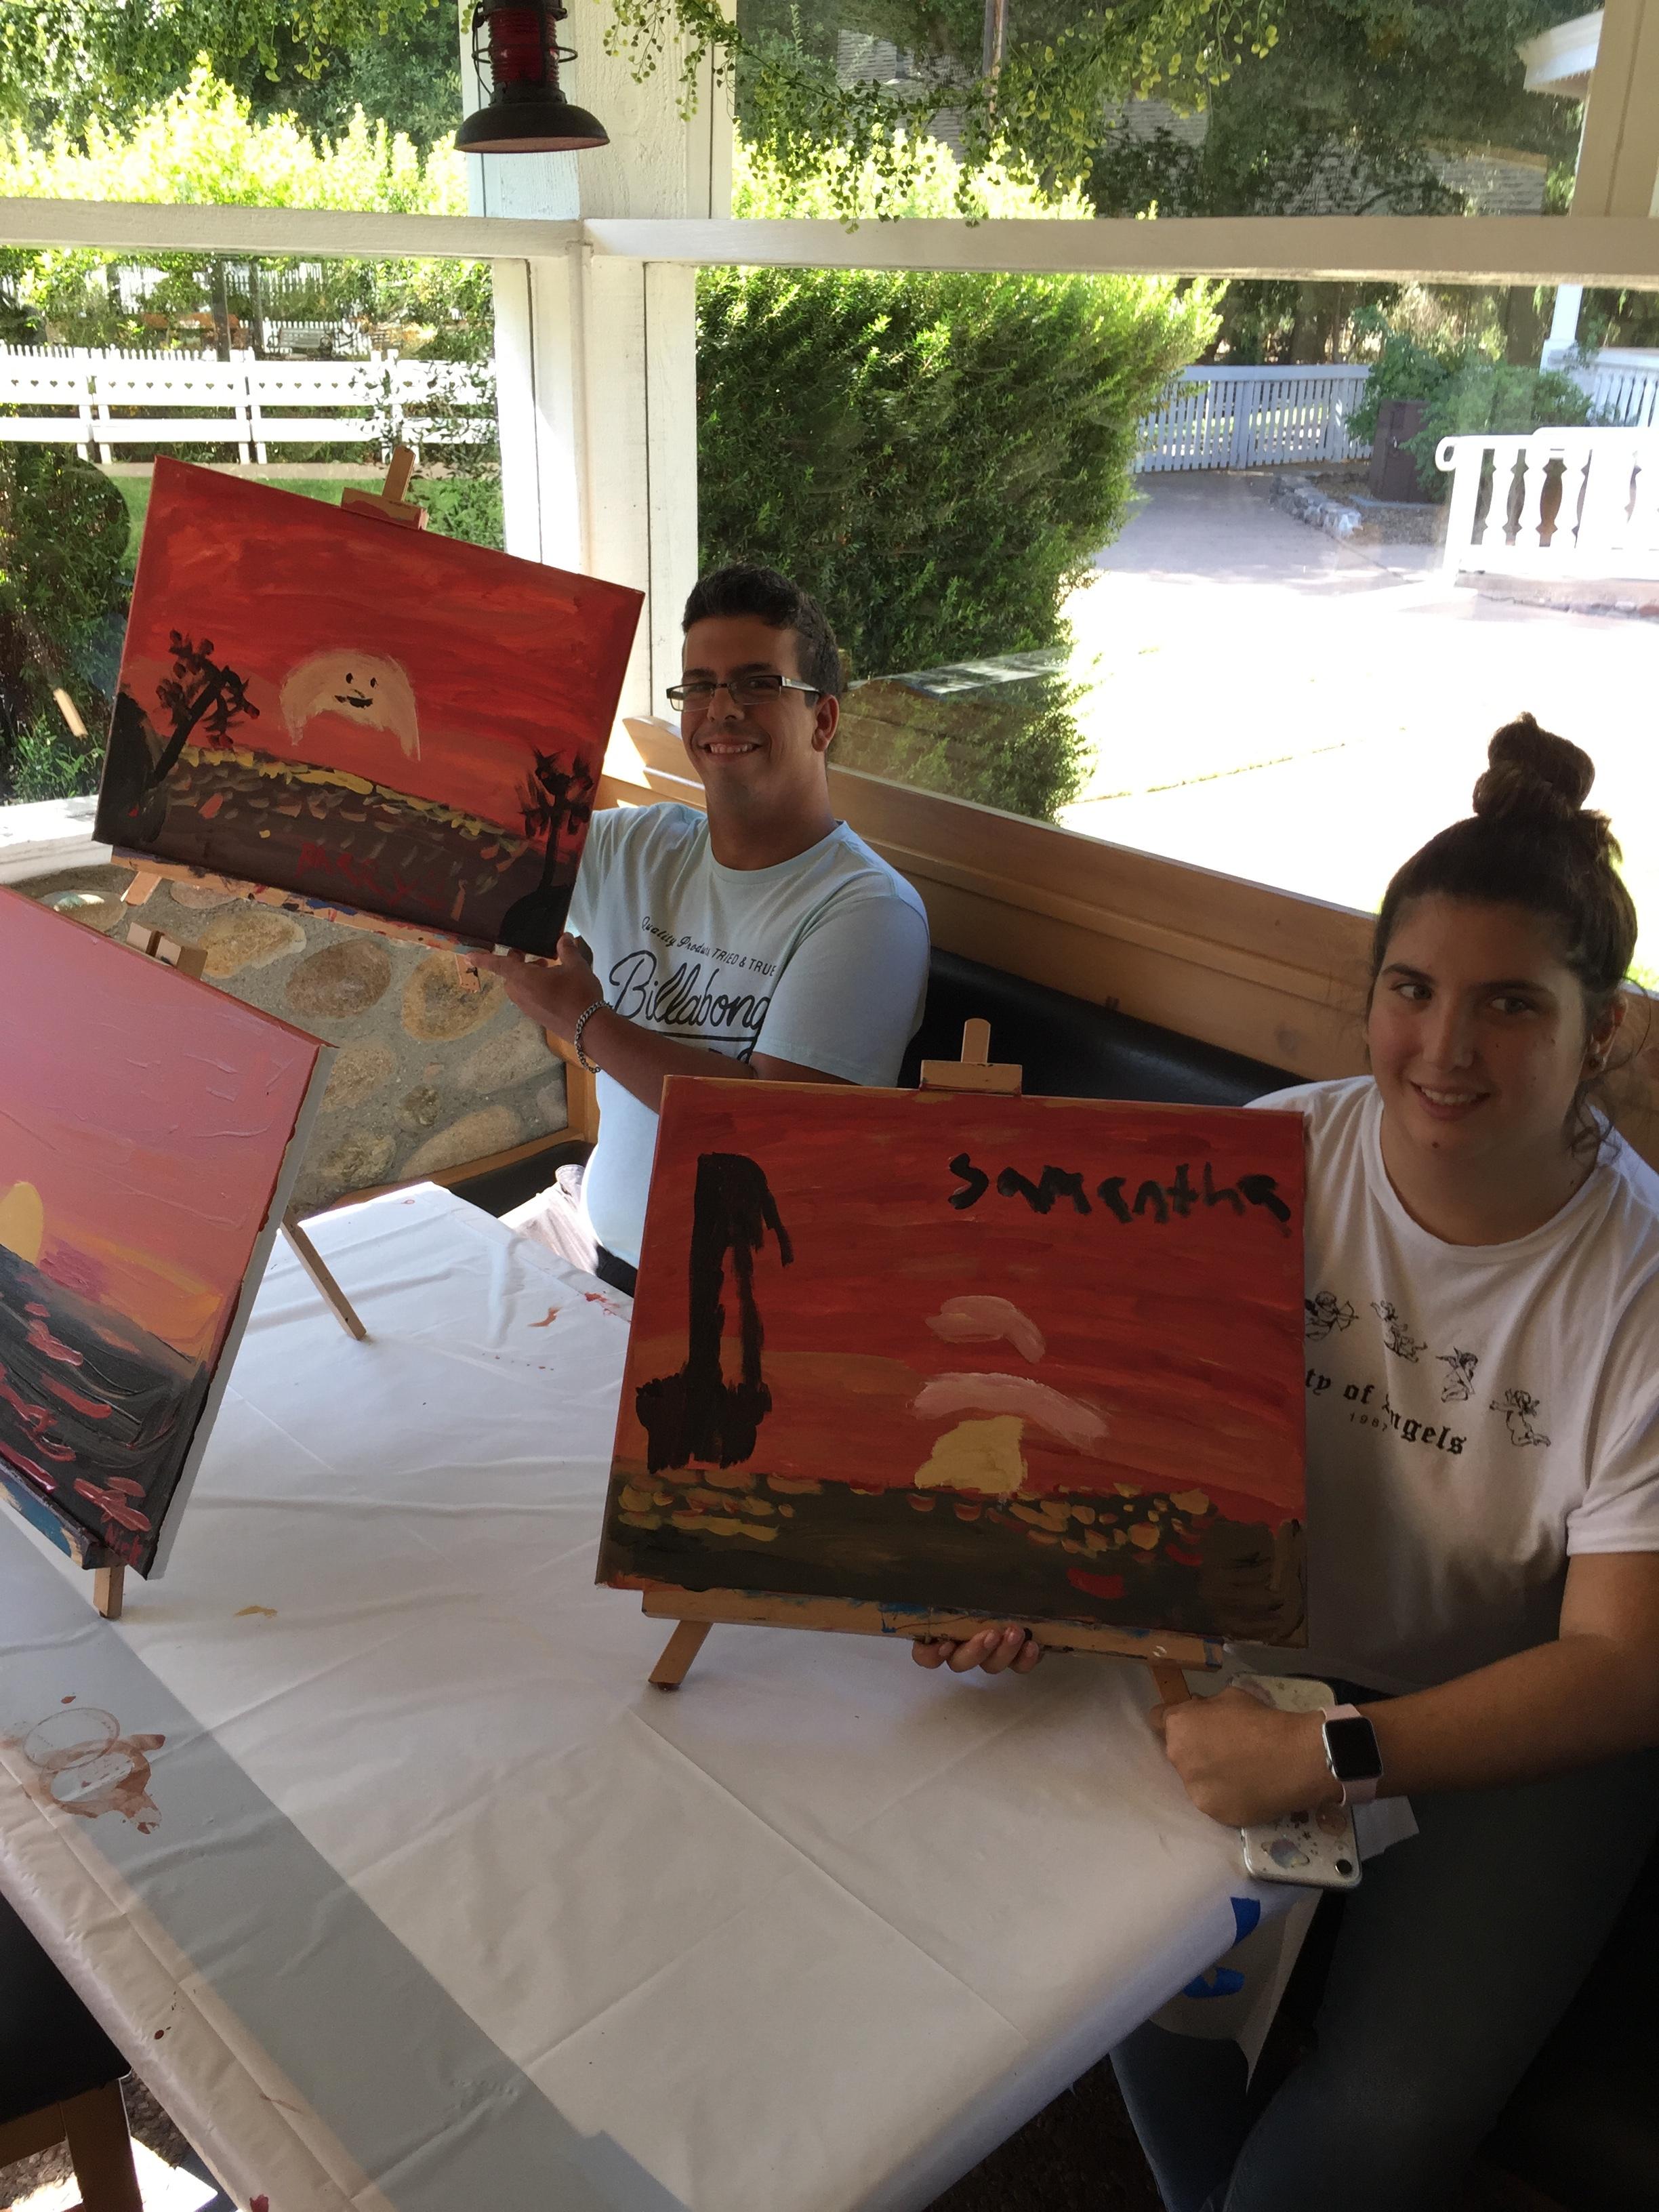 08-24-19 Villa de Vida Social Club Activity